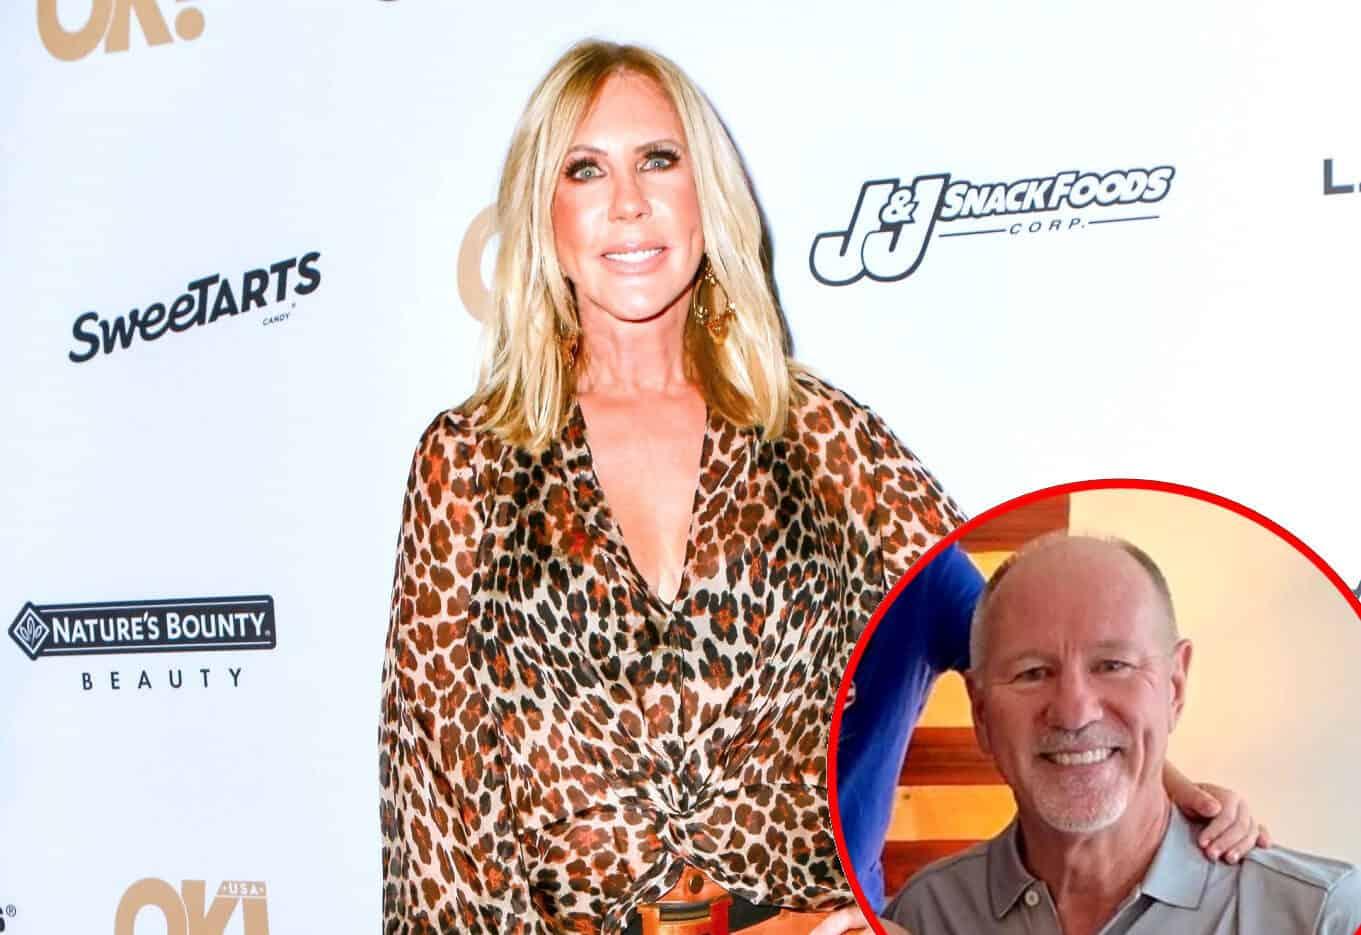 RHOC Star Vicki Gunvalson Reveals if She Still Speaks to Ex-Husband Donn Gunvalson, Talks Having to Pay Him Money After Their Divorce